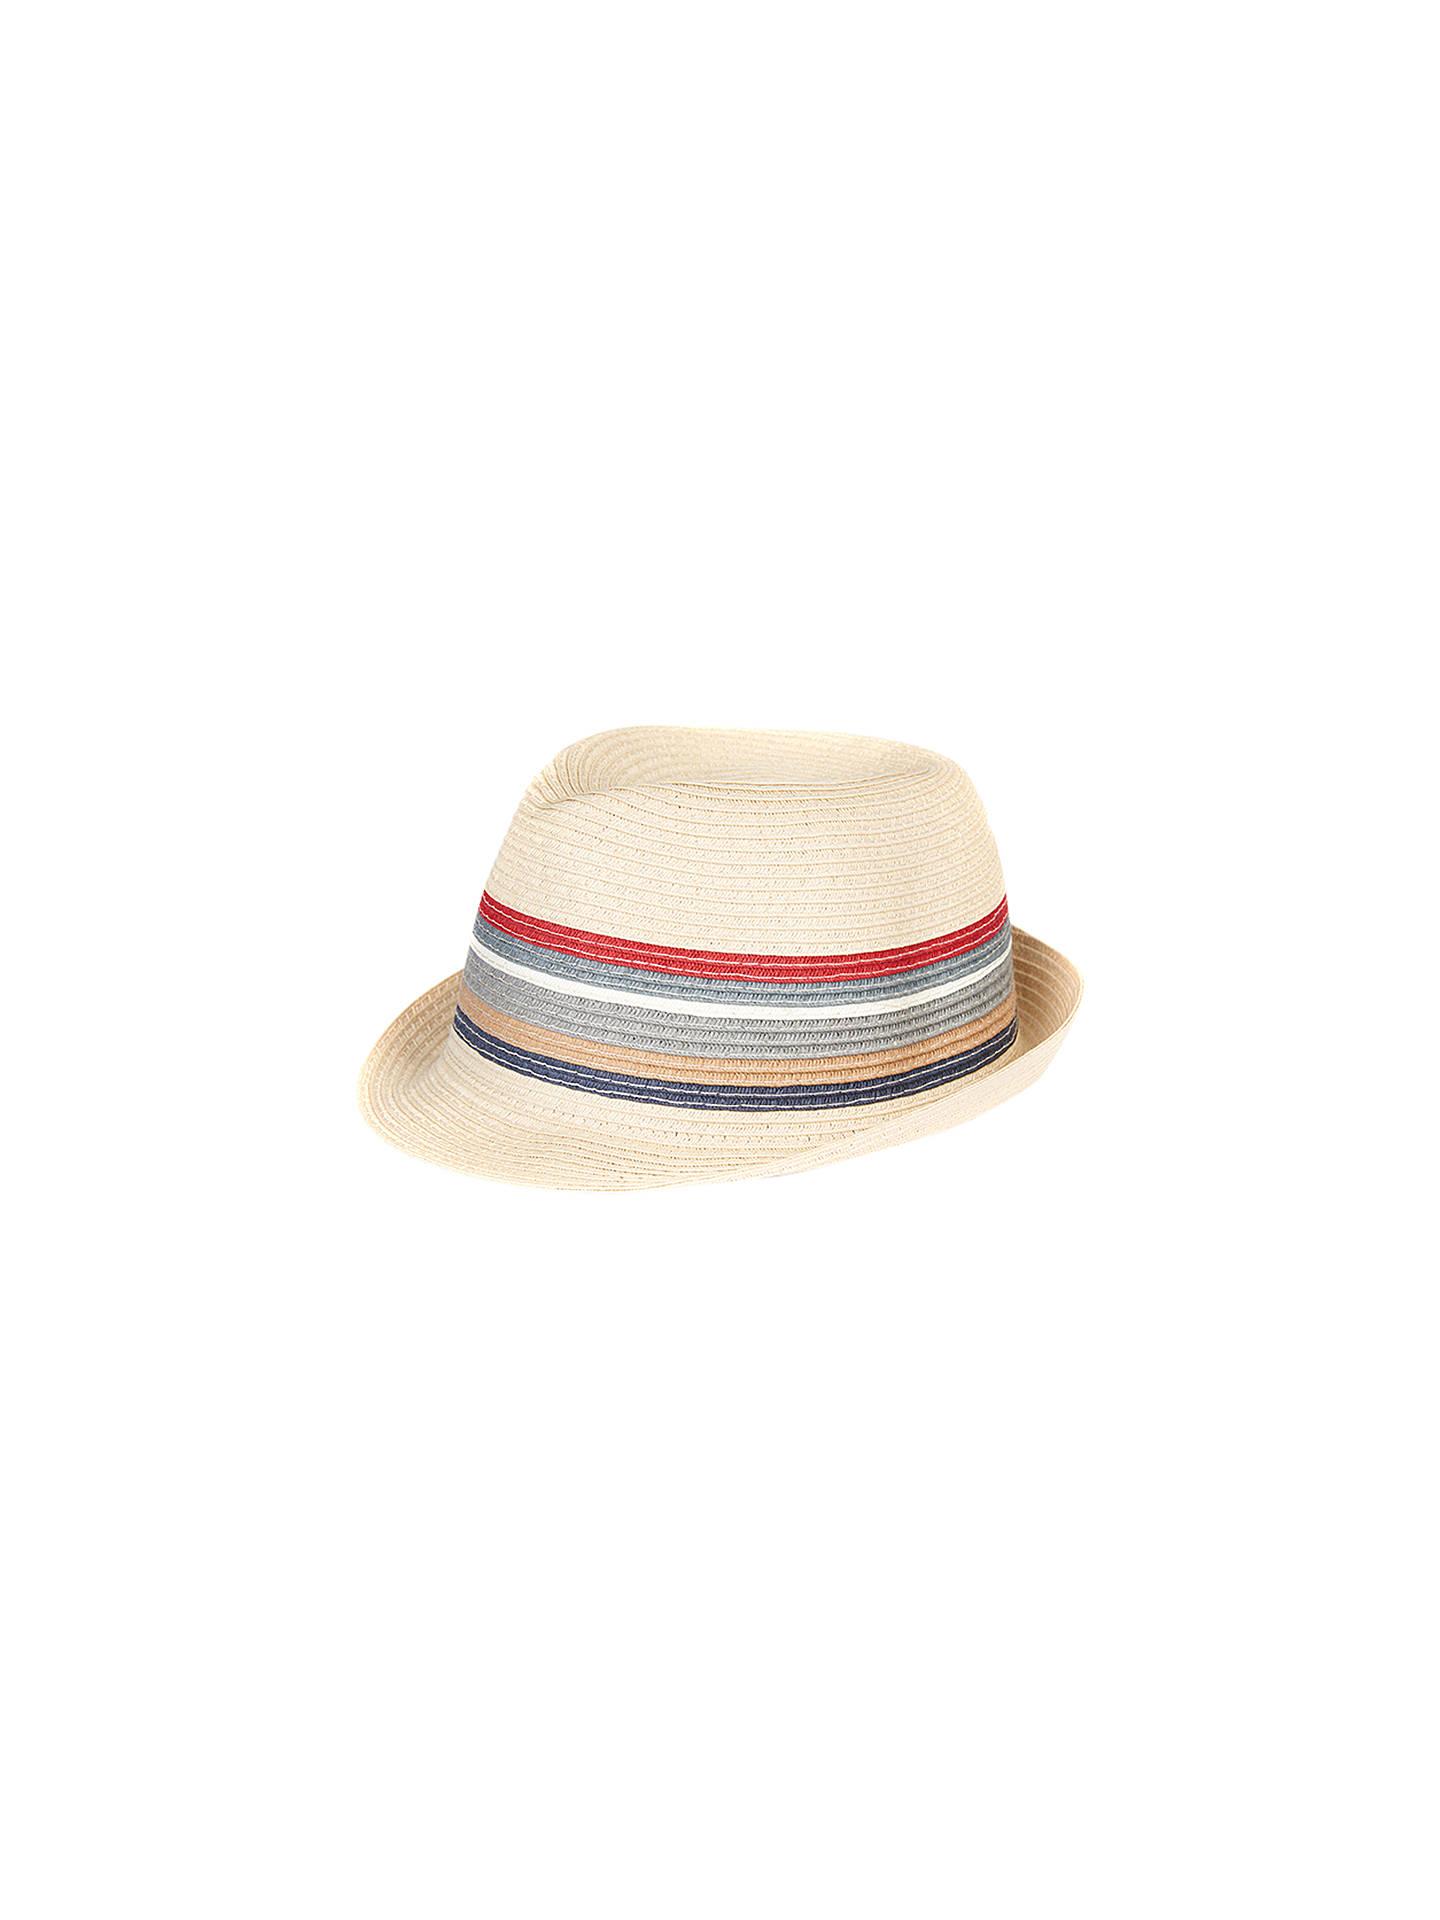 BuyBarbour Stripe Trilby Hat d8b6c6b187e